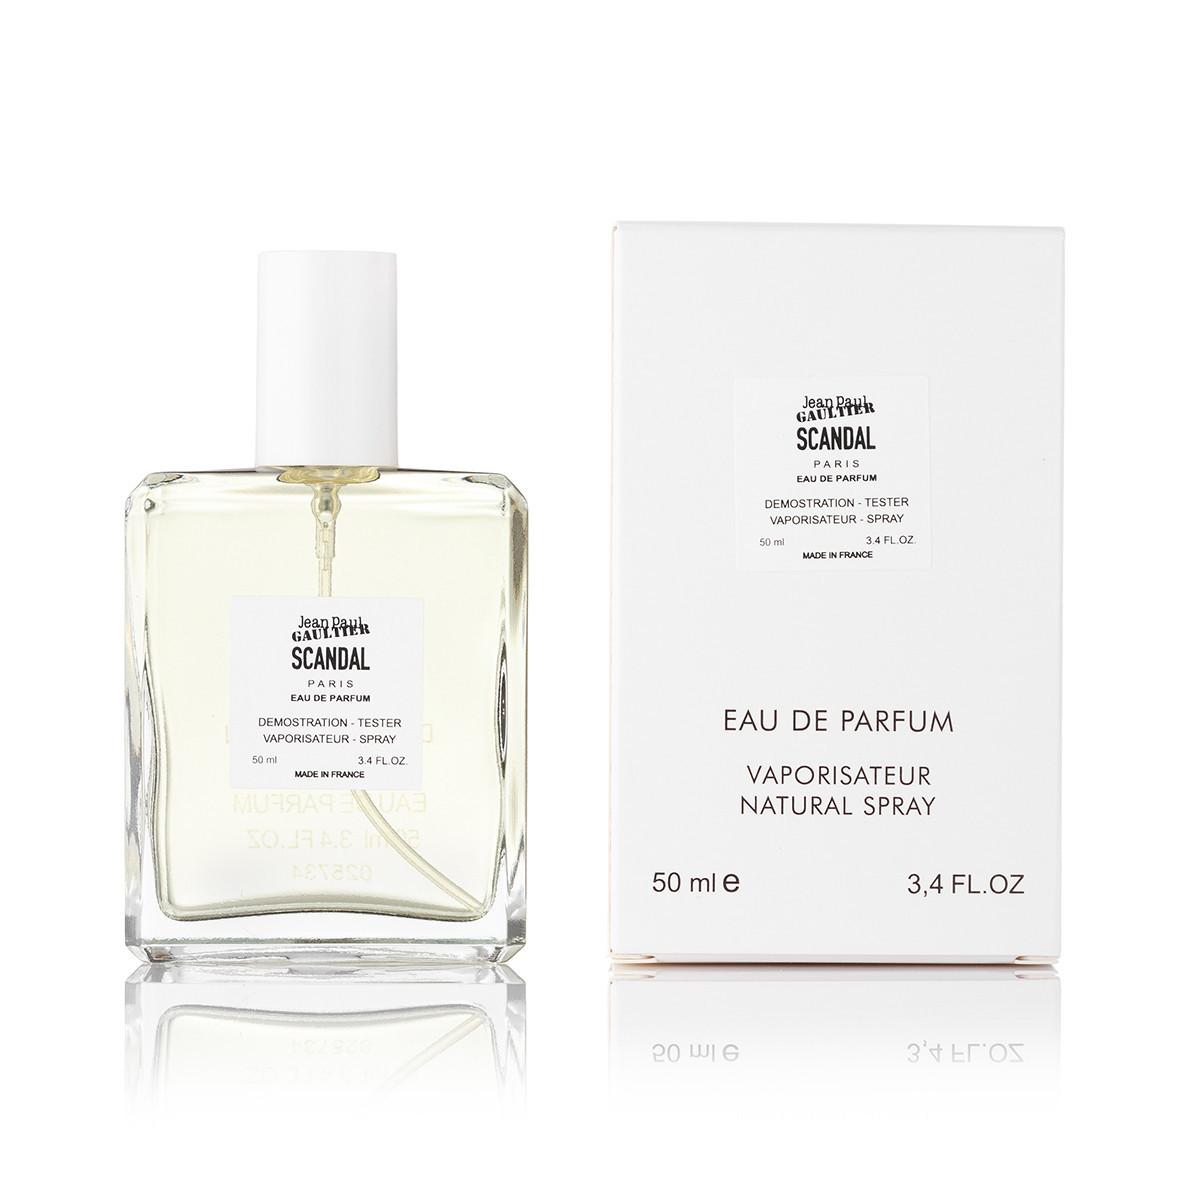 Женский мини парфюм Scandal Jean Paul Gaultier (Жан Поль Готье Скандал ) тестер 50 мл (реплика)